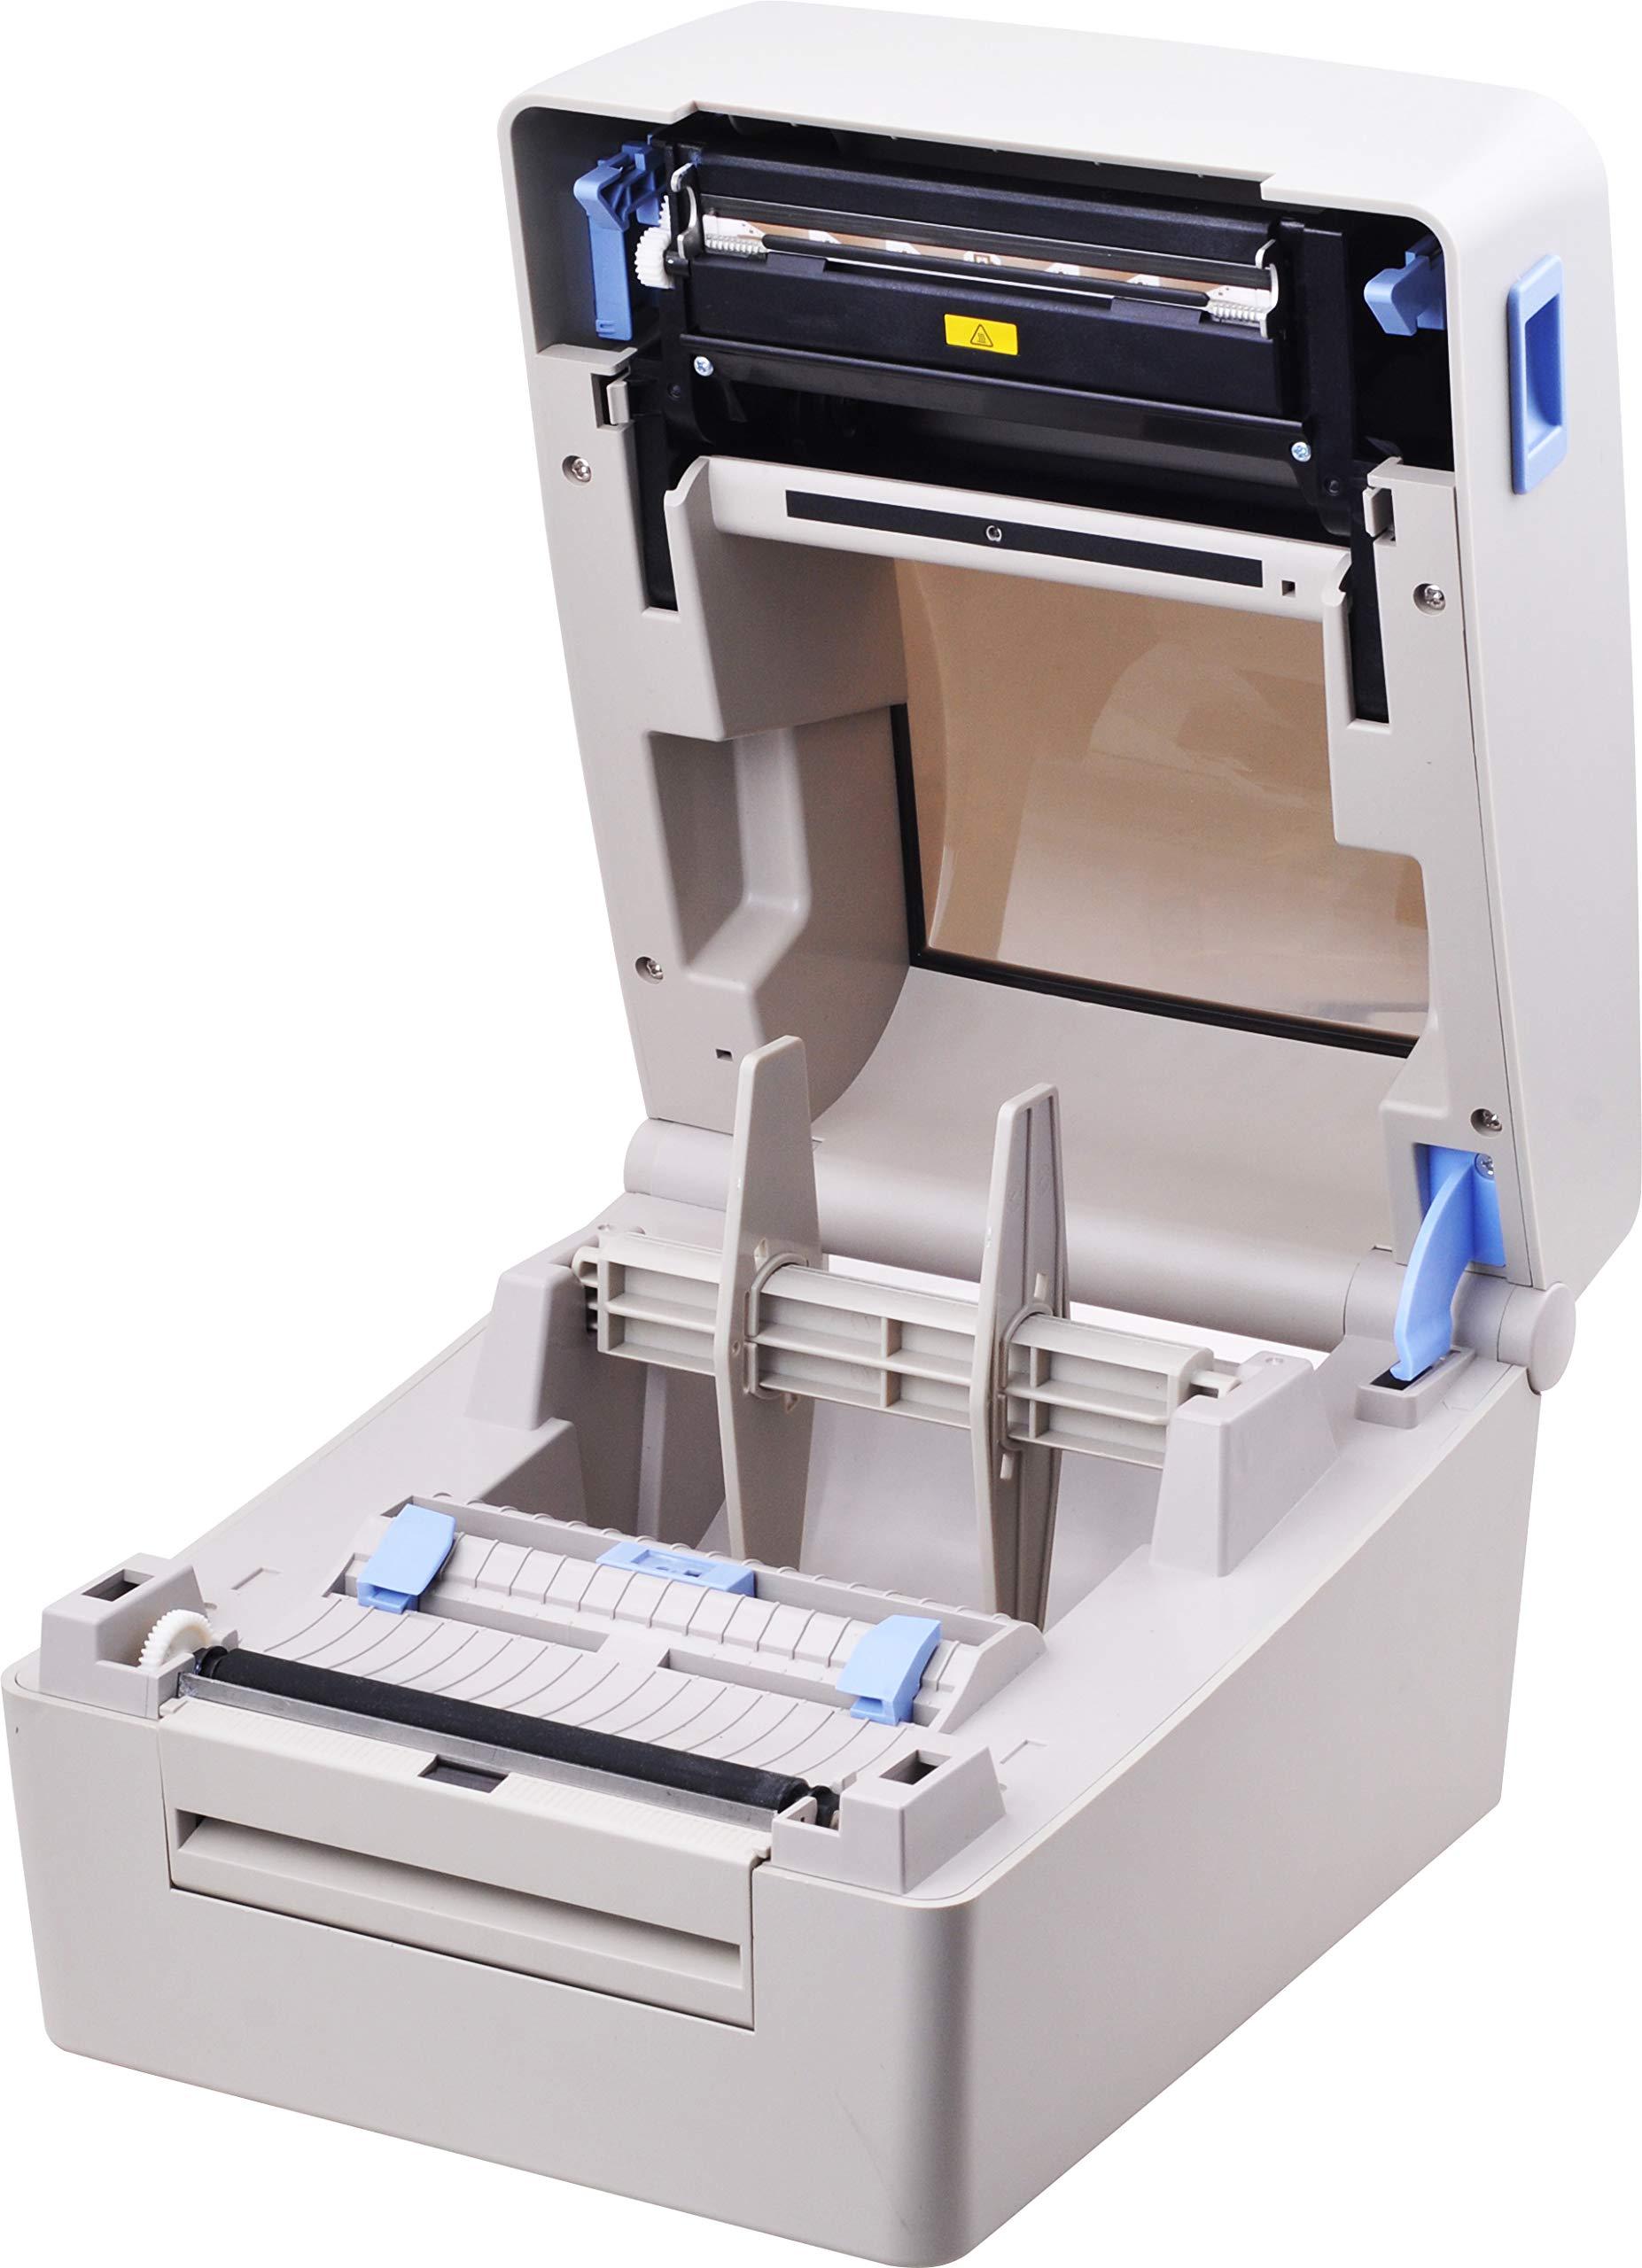 Xprinter XP-TT424B 110mm 4.3inch 203dpi Thermal and Thermal-Transfer Label Printer,Thermal and Thermal-Transfer Barcode Printer, USB 2.0 Interface by xprinter (Image #2)